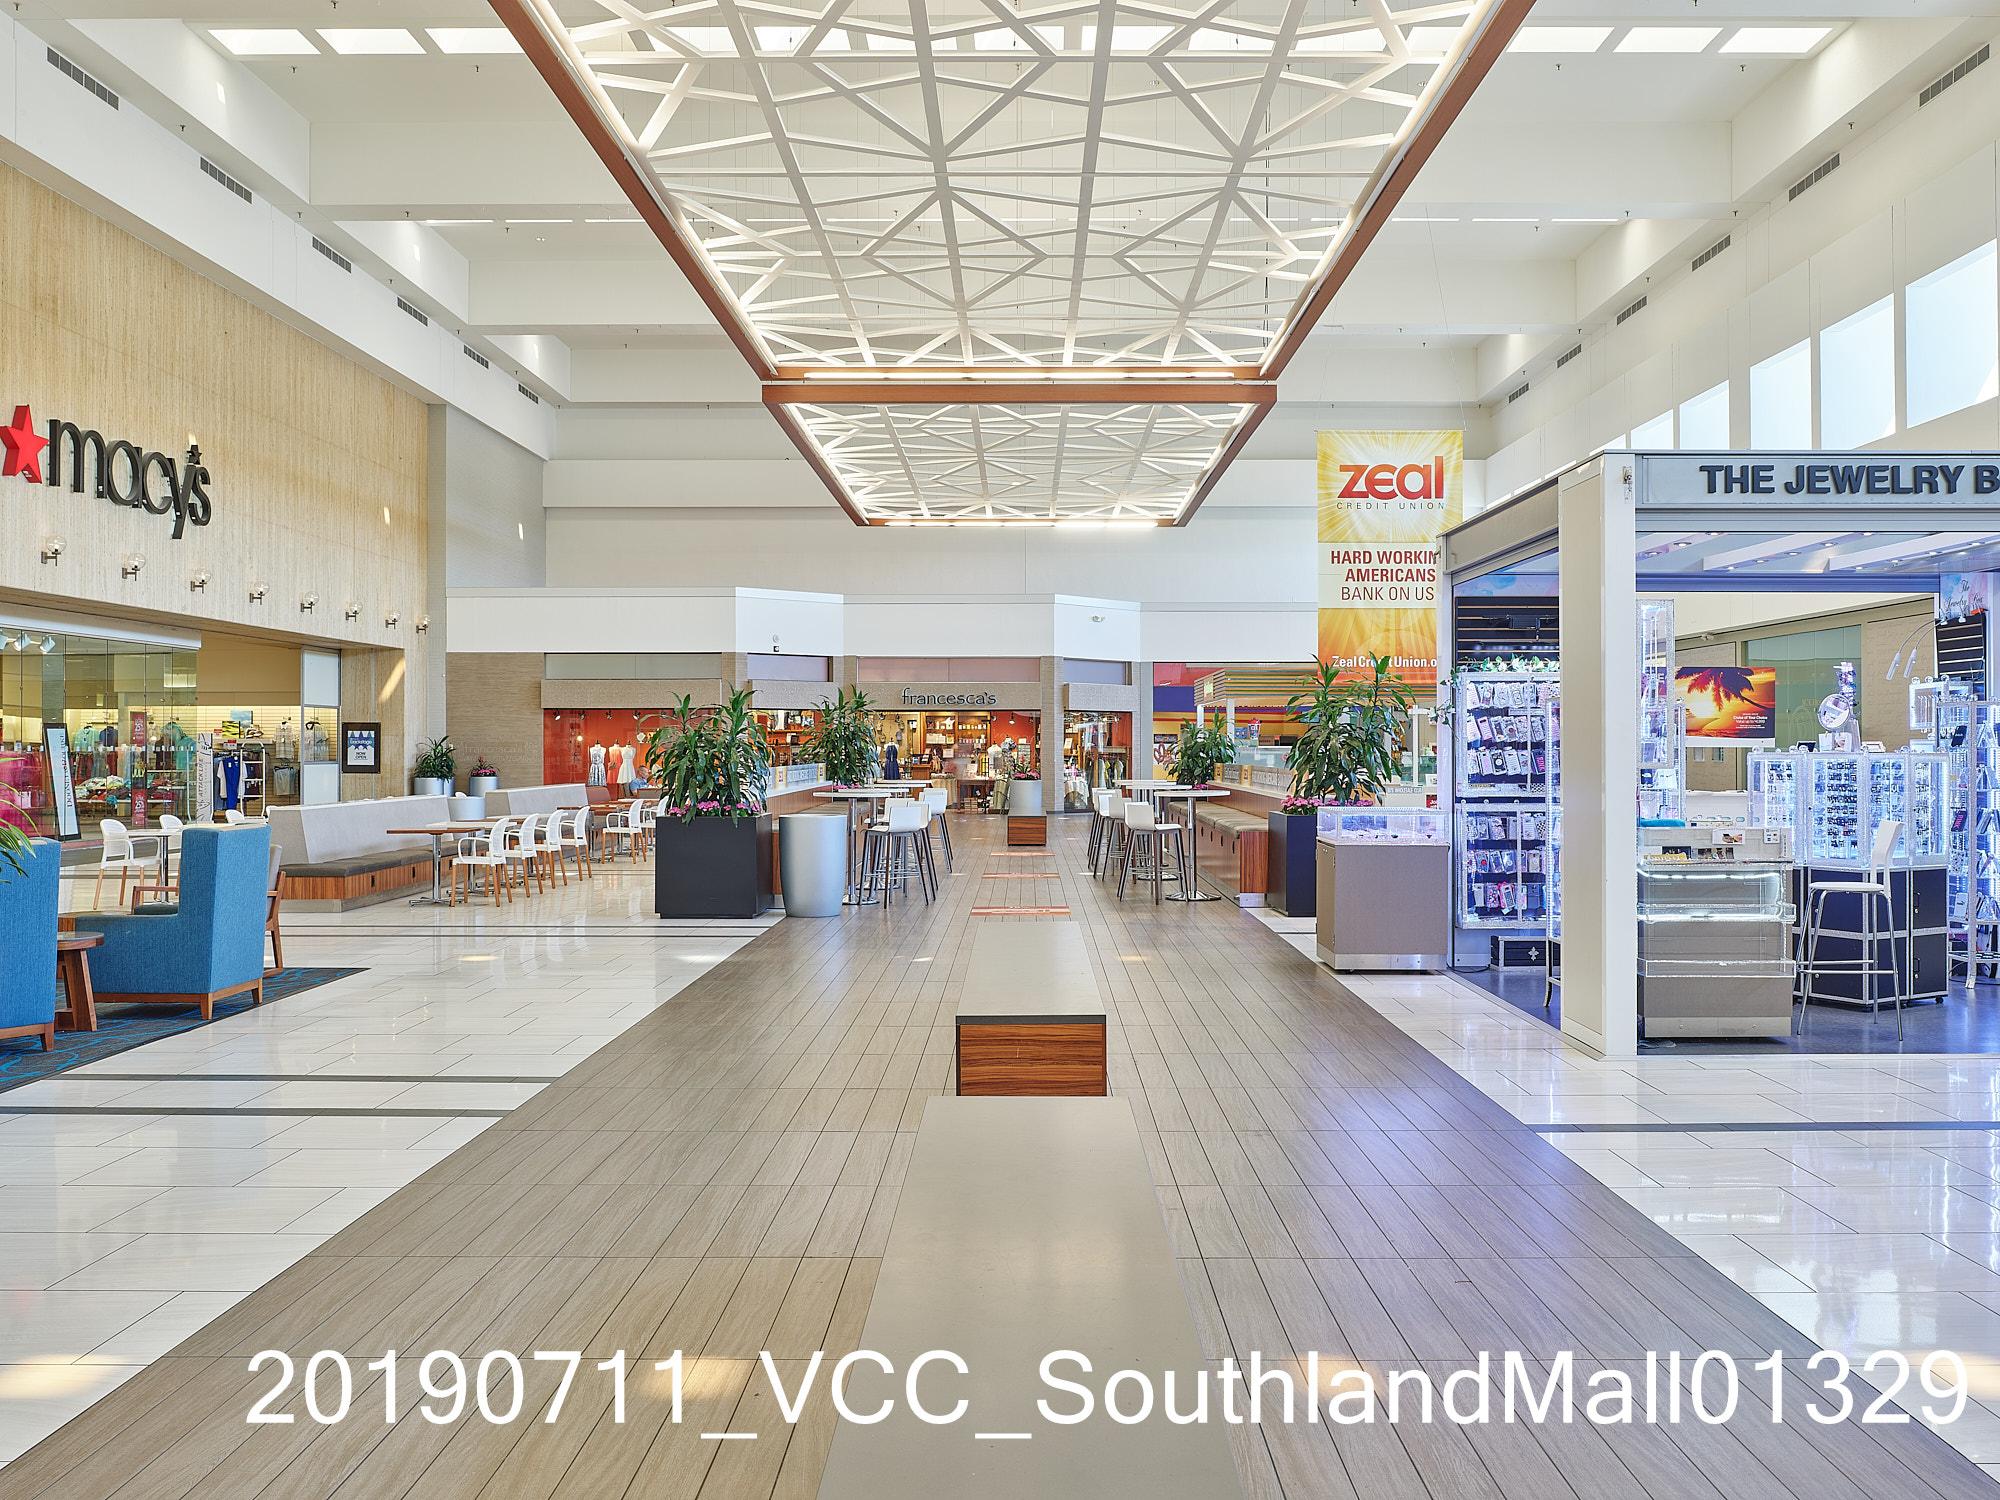 20190711_VCC_SouthlandMall01329.jpg